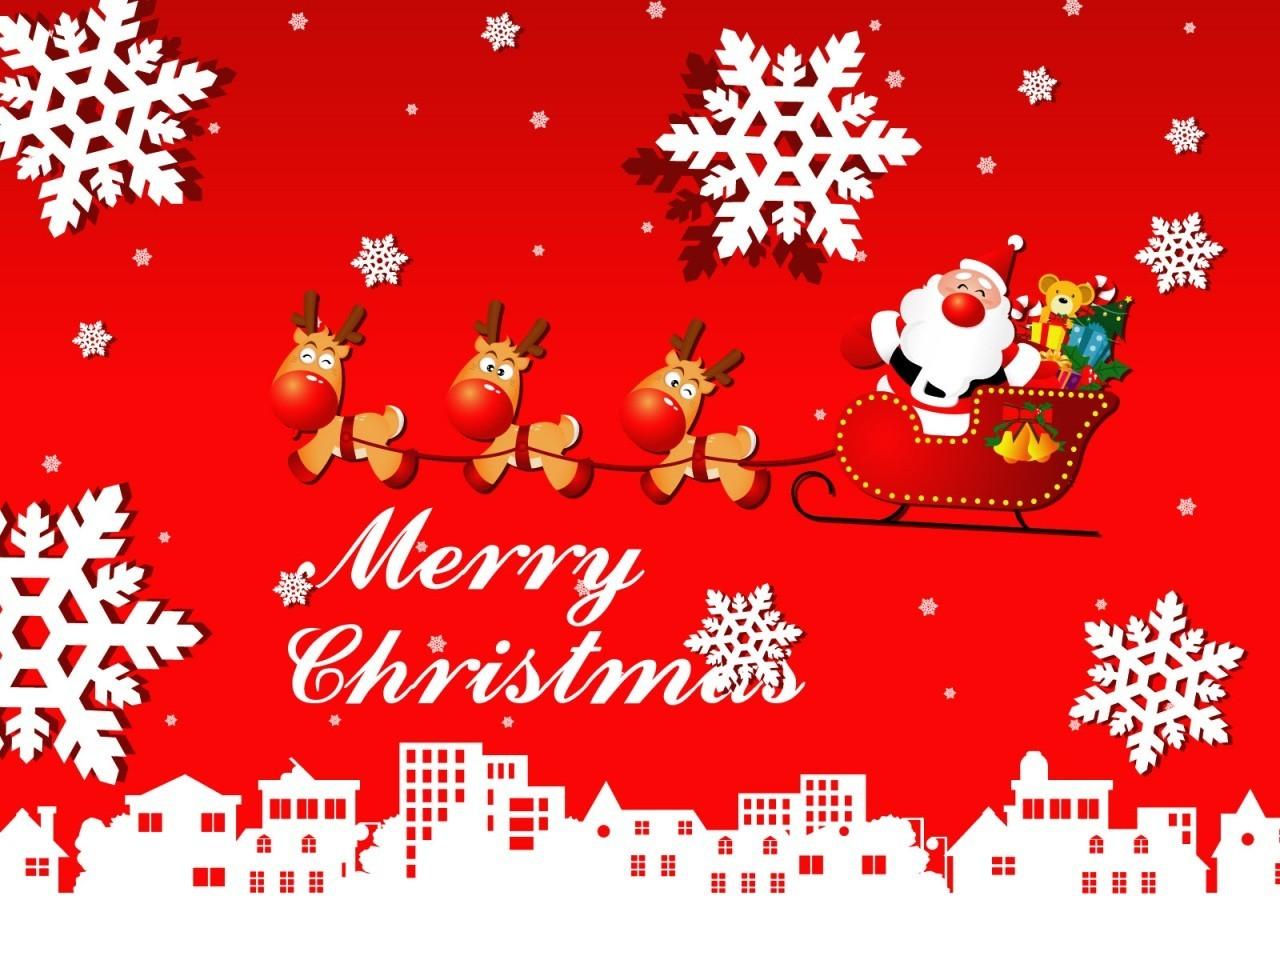 http://4.bp.blogspot.com/-IwTQqYmlCBc/UNlTgfPYyaI/AAAAAAAAABA/ohM8IfCp0z0/s1600/Merry-Christmas-Greetings-Cards-5.jpg